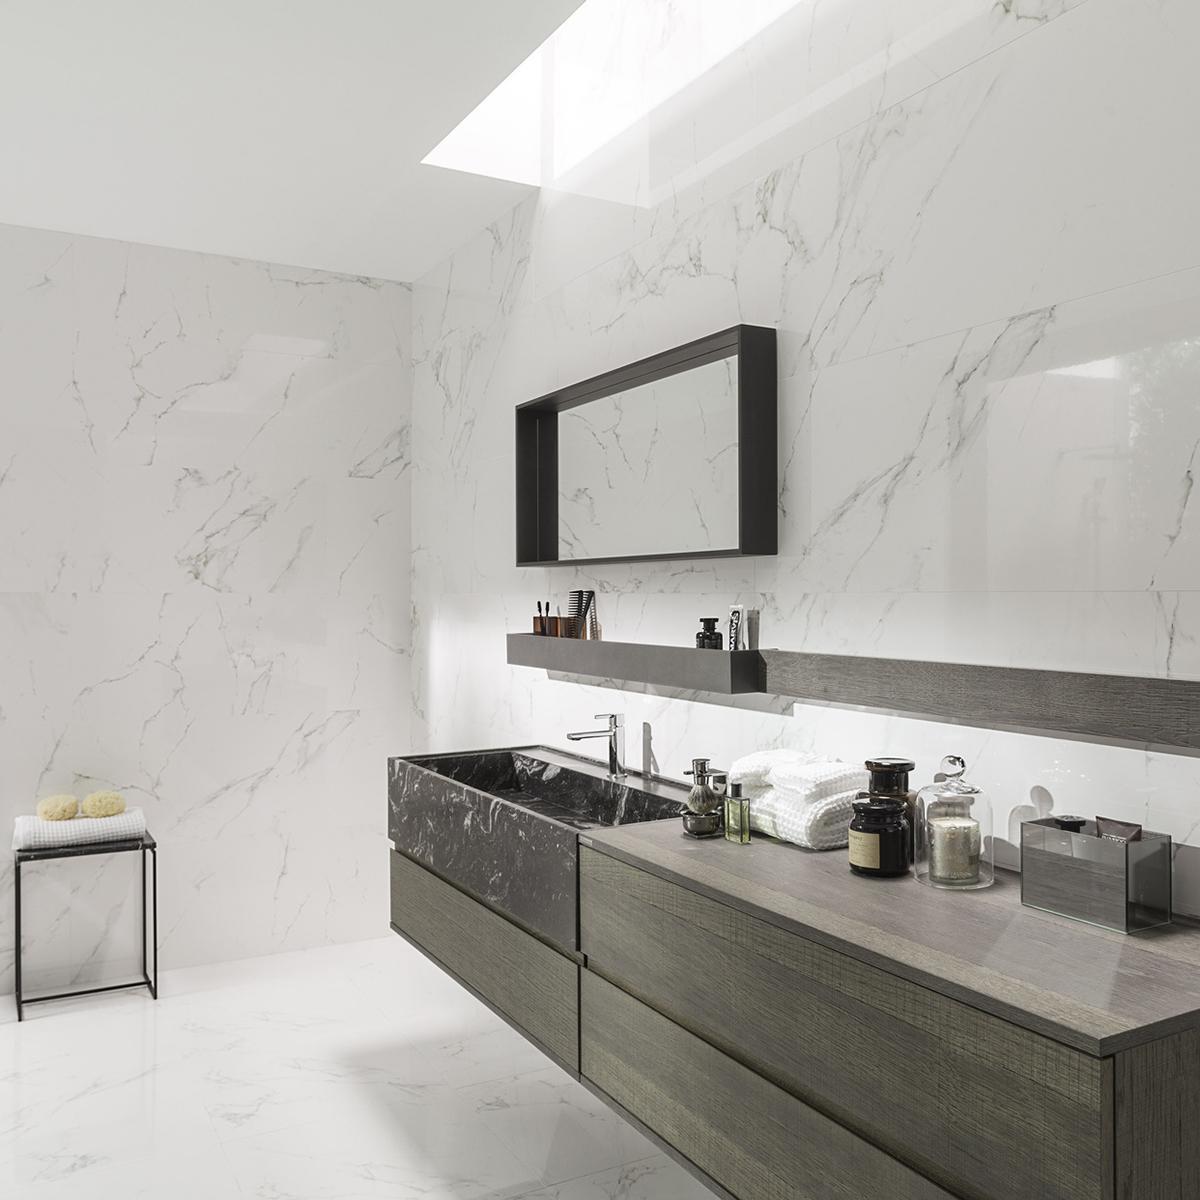 Mayólica Marmol Carrara Blanco Brillante - 45X120 cm - 1.62 m2